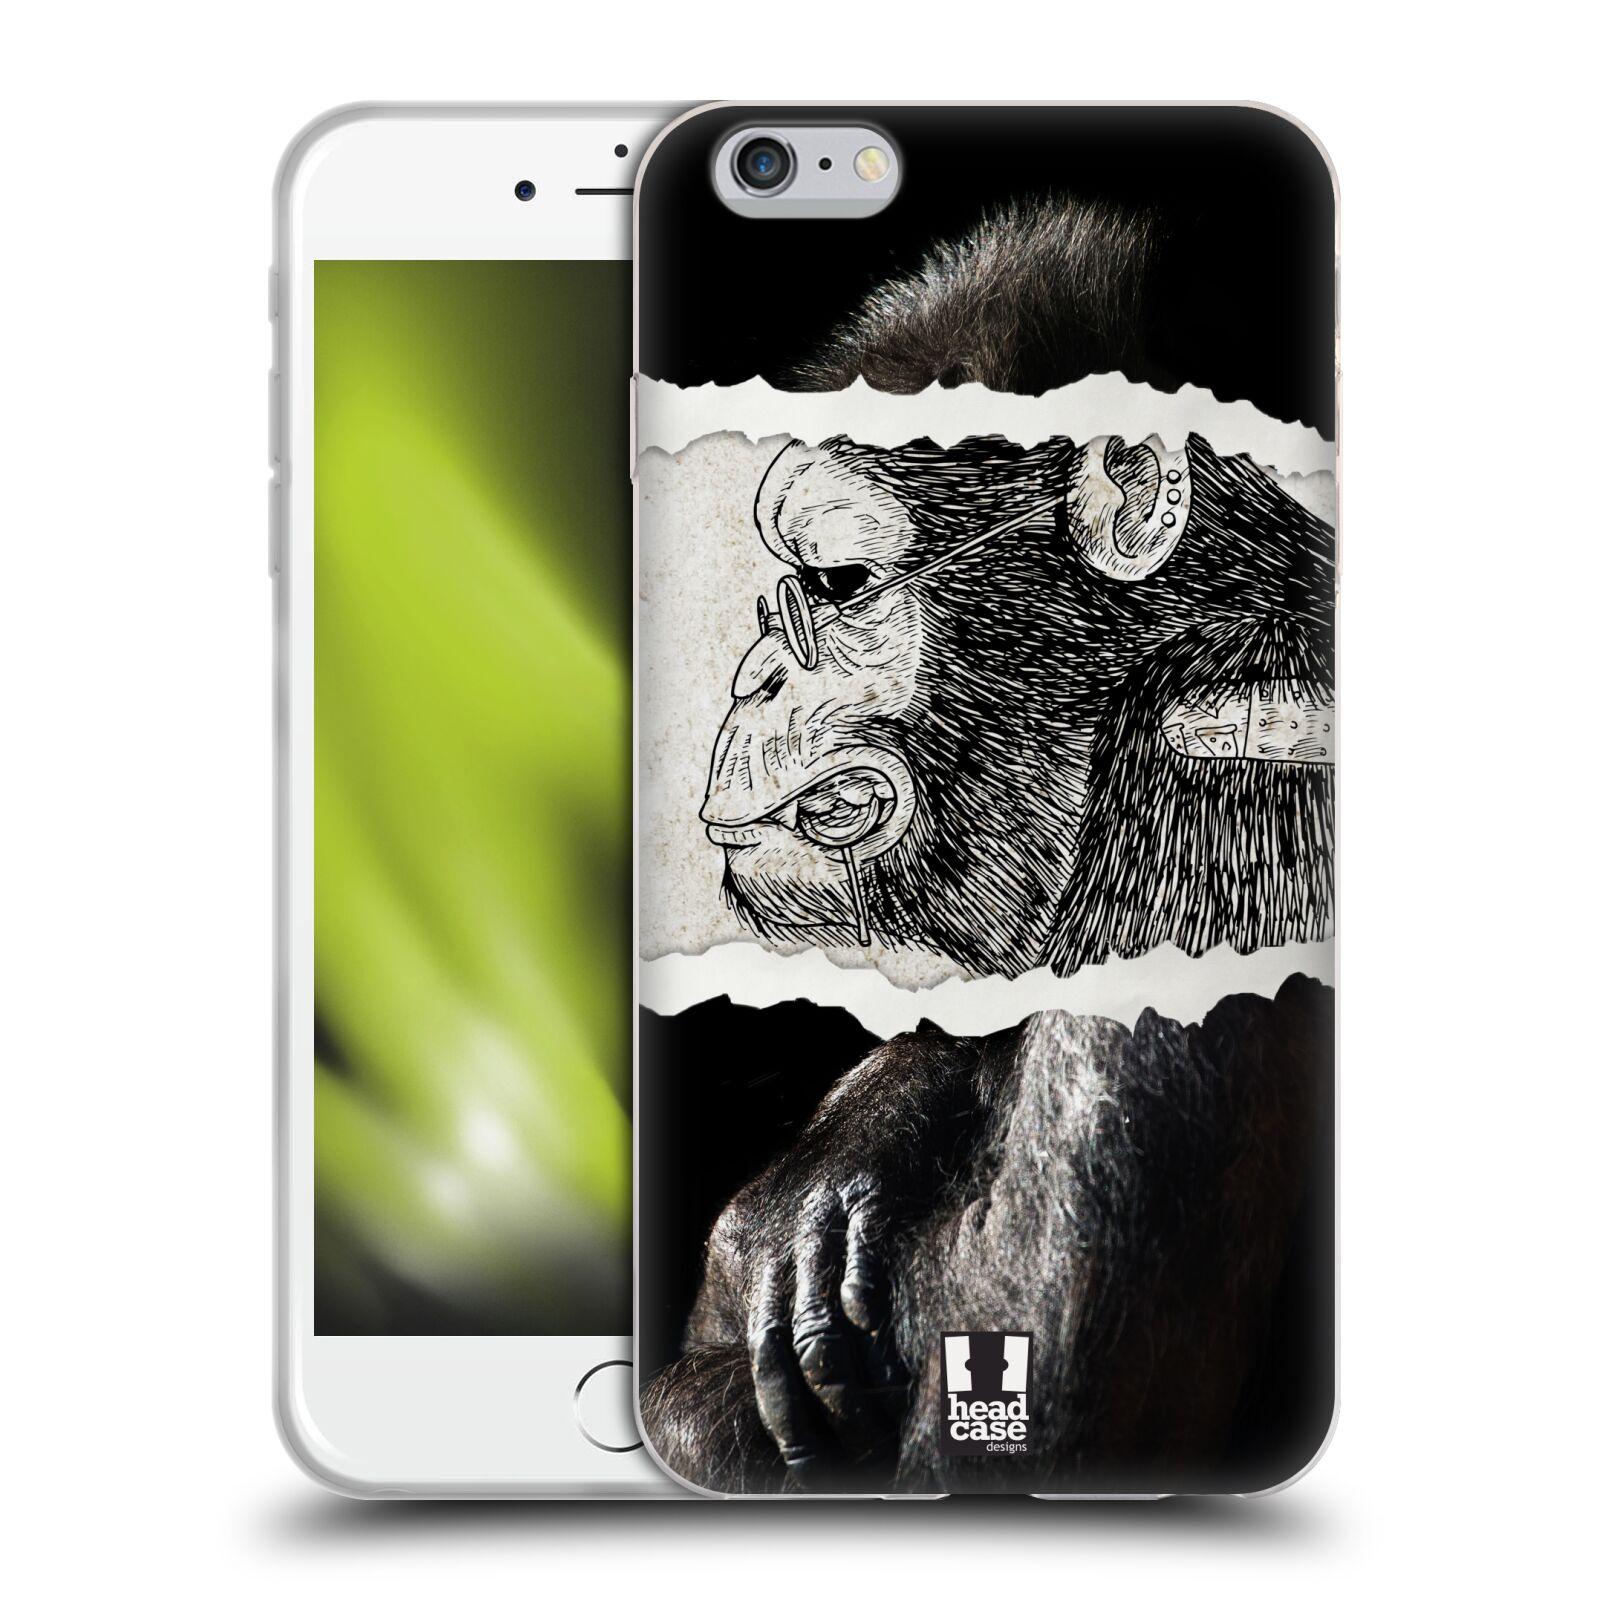 HEAD CASE silikonový obal na mobil Apple Iphone 6 PLUS/ 6S PLUS vzor zvířata koláž opice